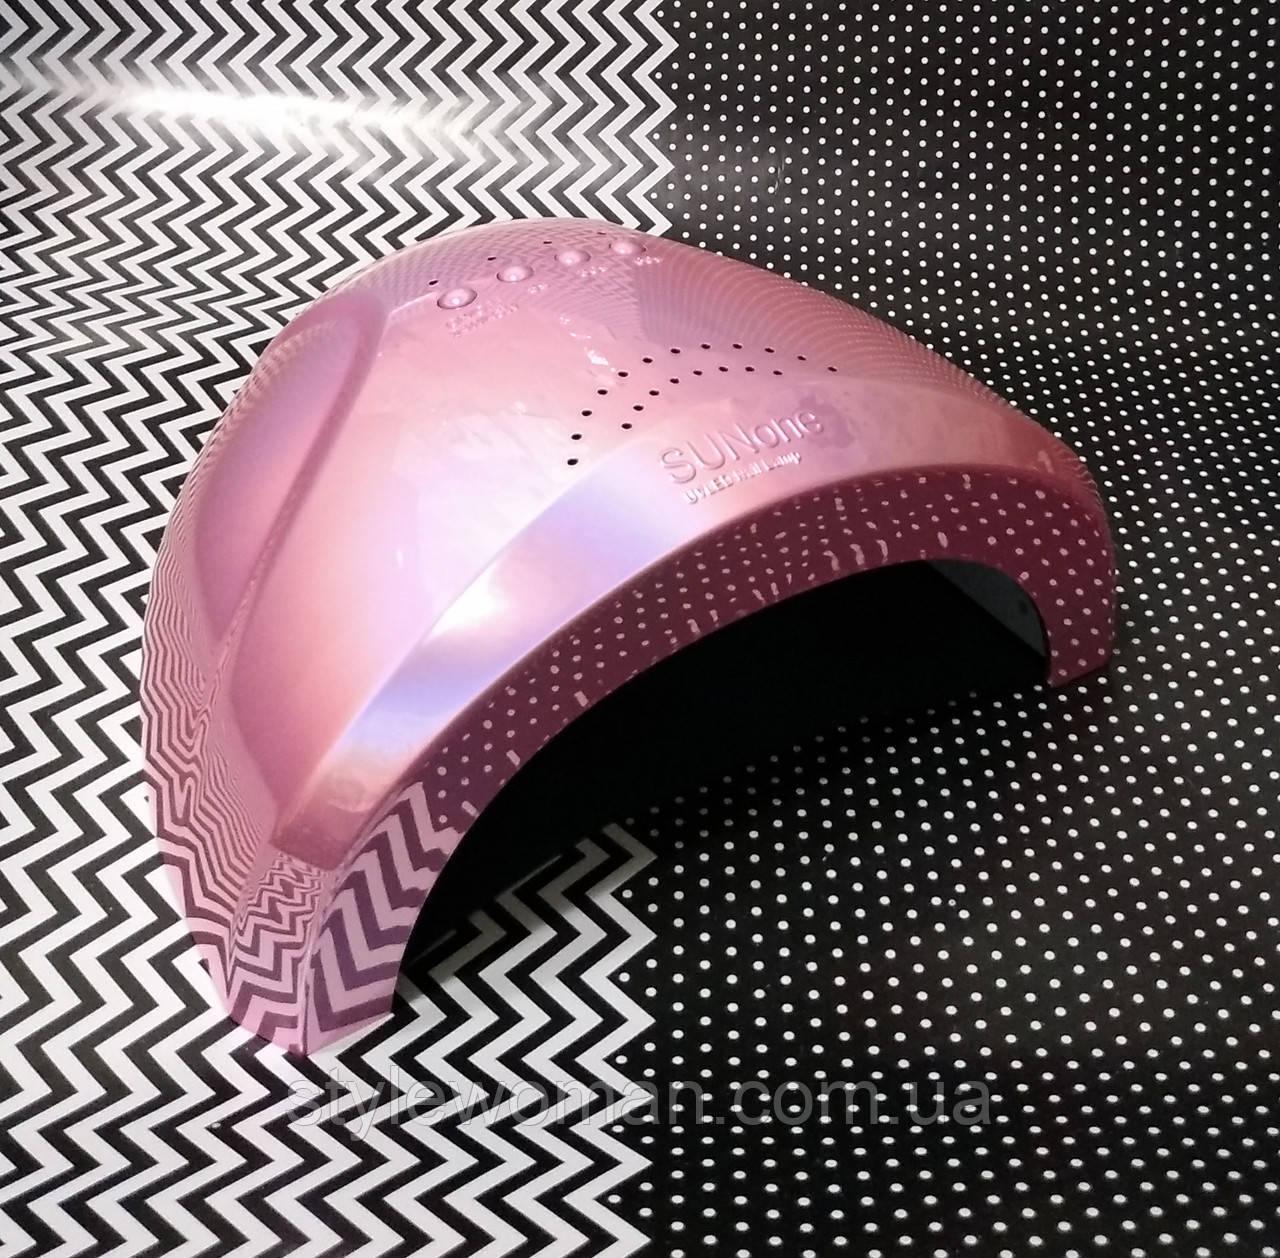 SUN UV LED Лампа Сан Ван 48W профессиональная лампа для сушки ногтей хамелеон розовый жемчуг